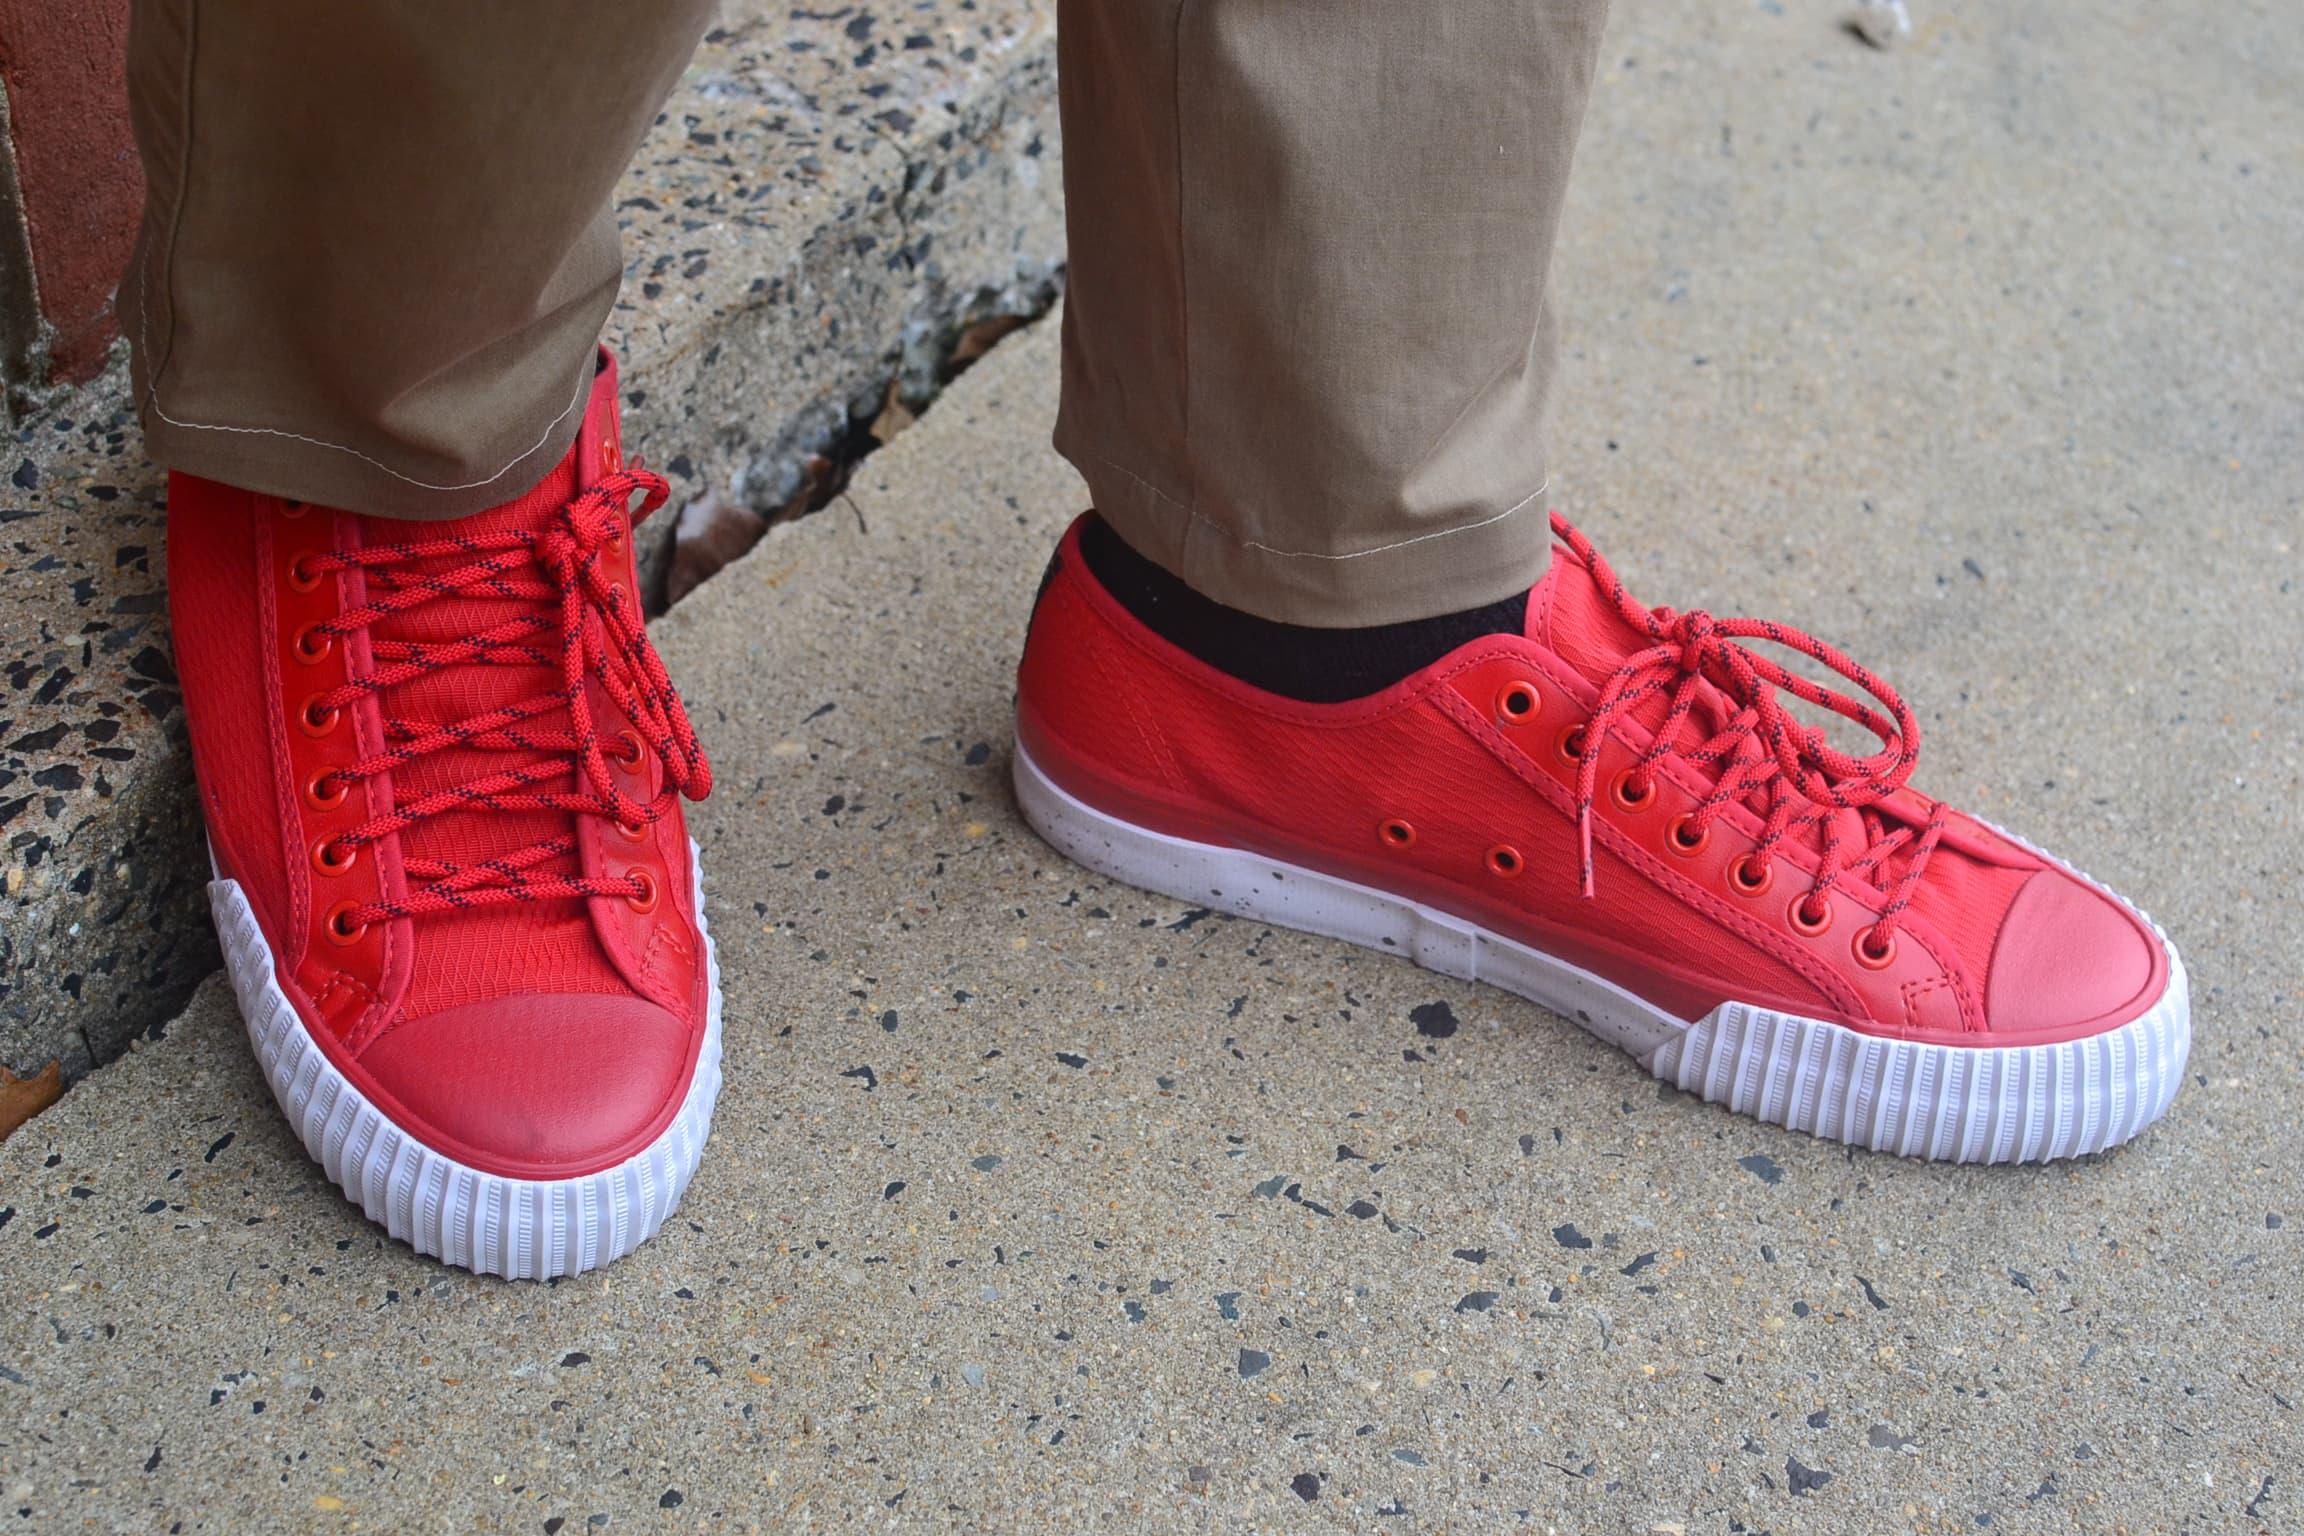 Sabir M. Peele in PF Flyers Nylon Sneakers